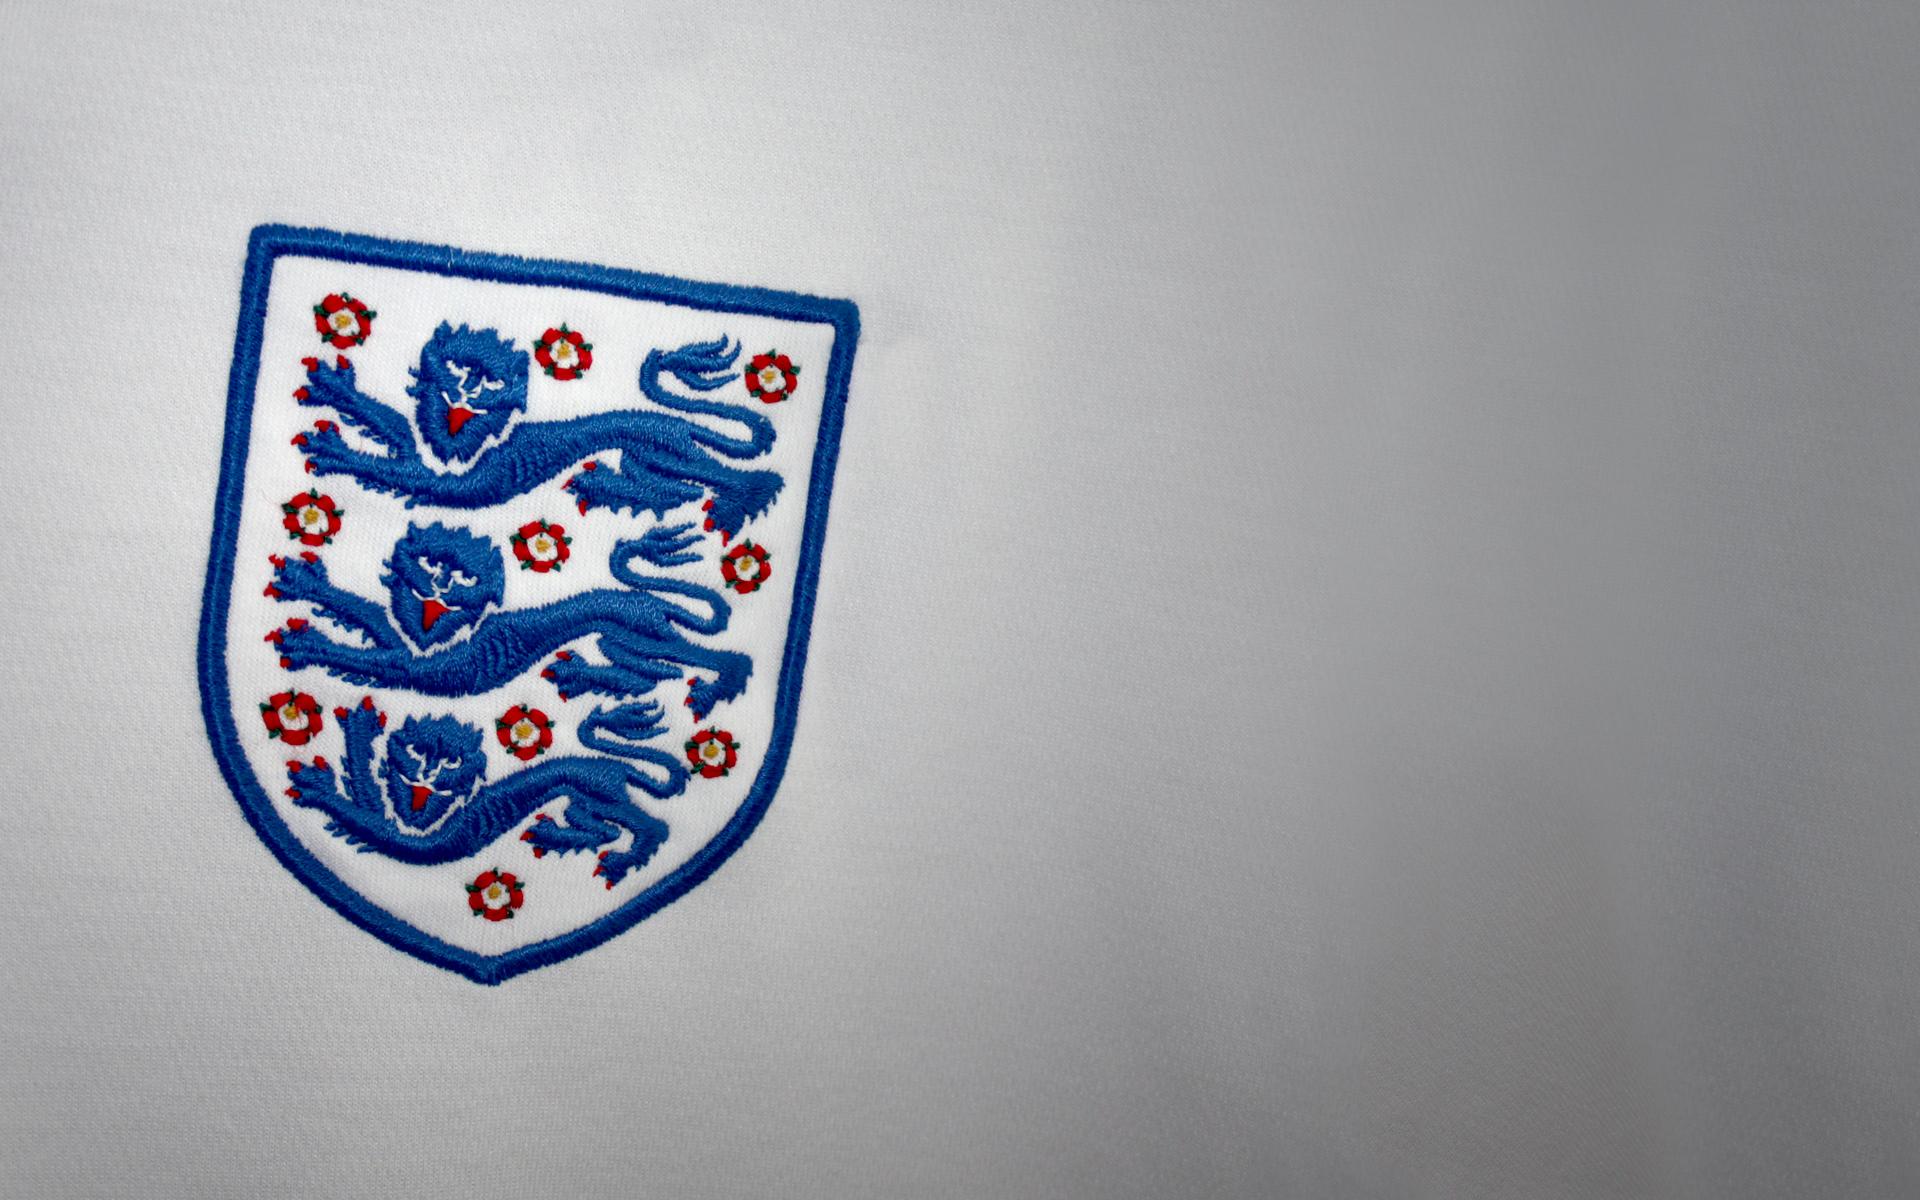 England Football Team Wallpaper